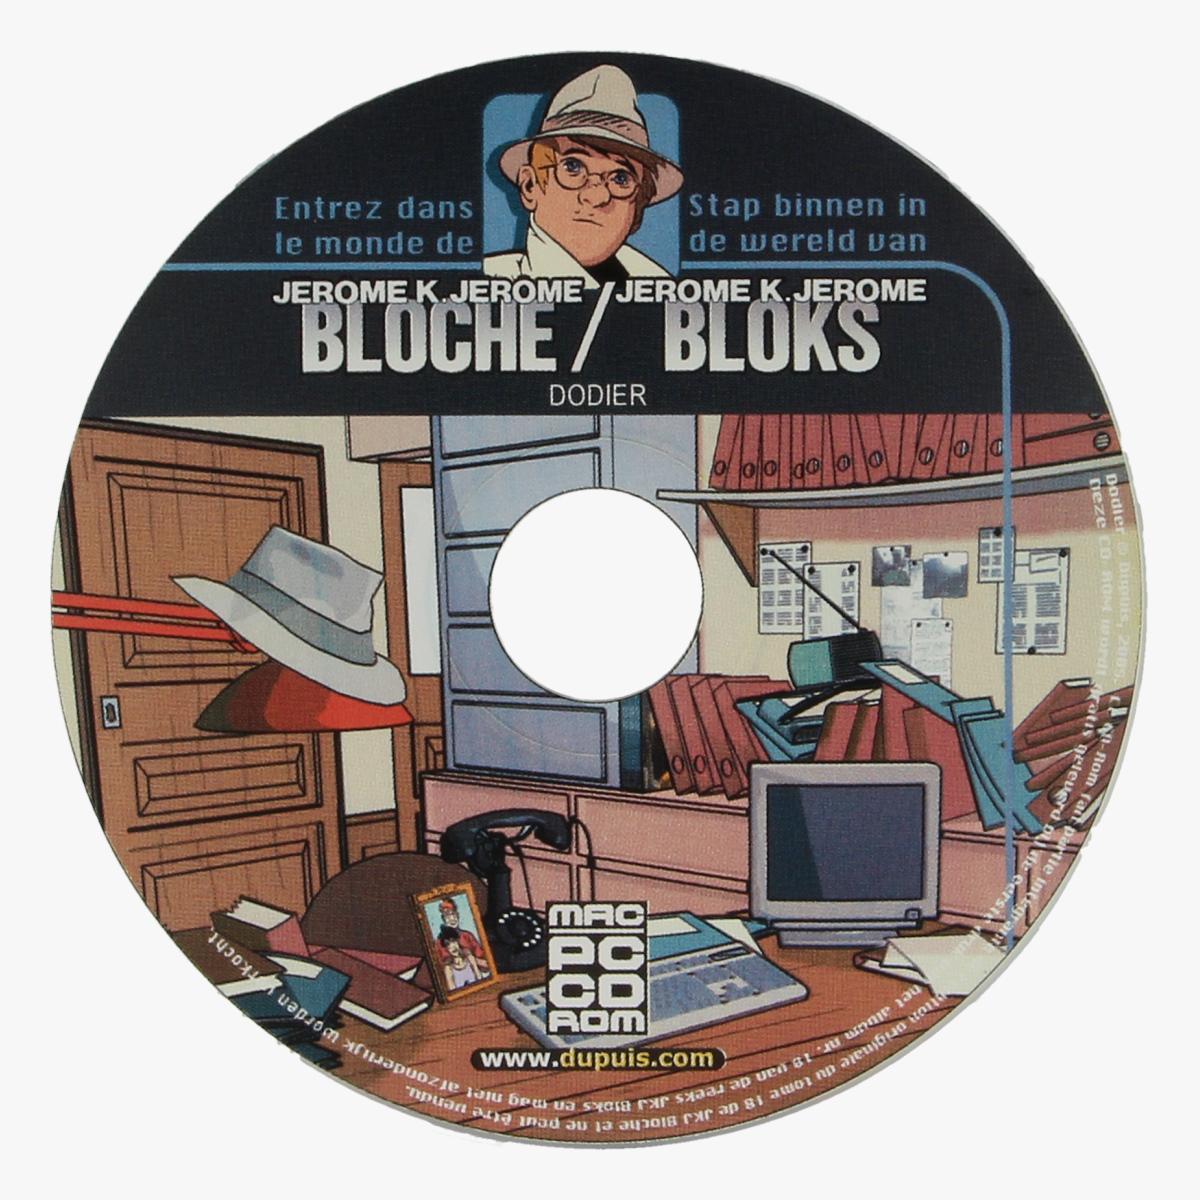 Afbeeldingen van Jerome K. Jerome Bloks Dodier PC CD-rom